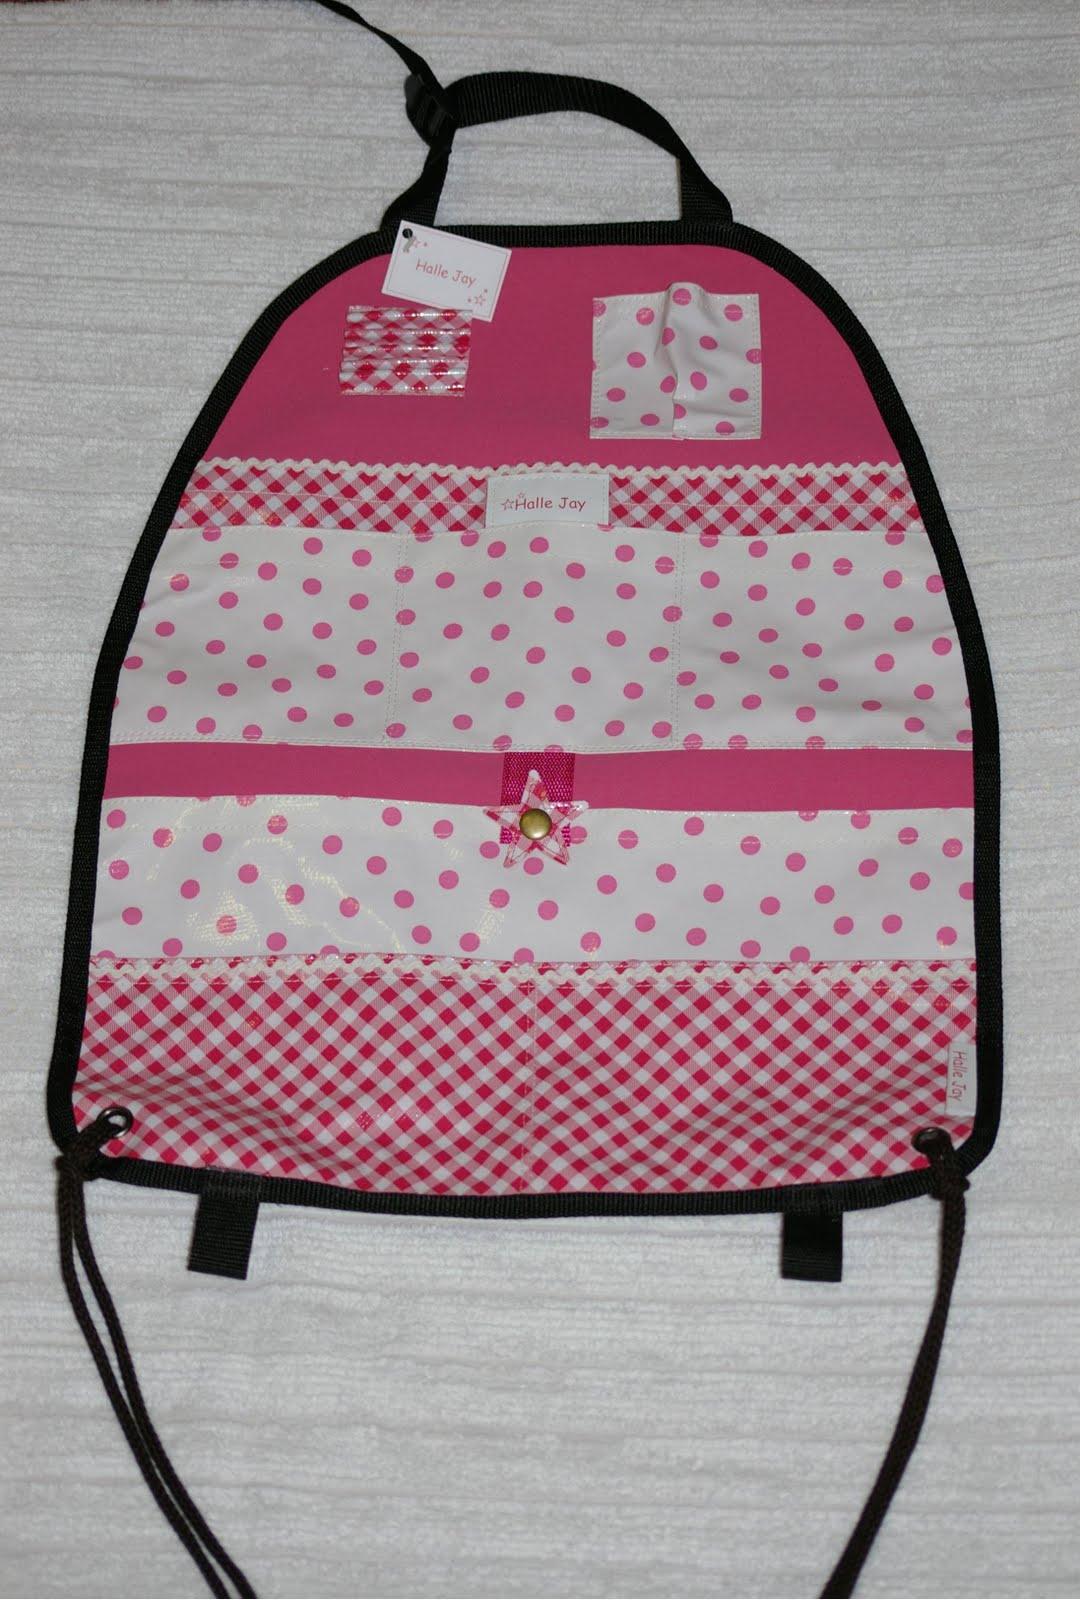 http://2.bp.blogspot.com/_NnozNse-NvU/TAsEIcXLObI/AAAAAAAAAaU/szcogI443yk/s1600/Car+Storage+Pink.JPG